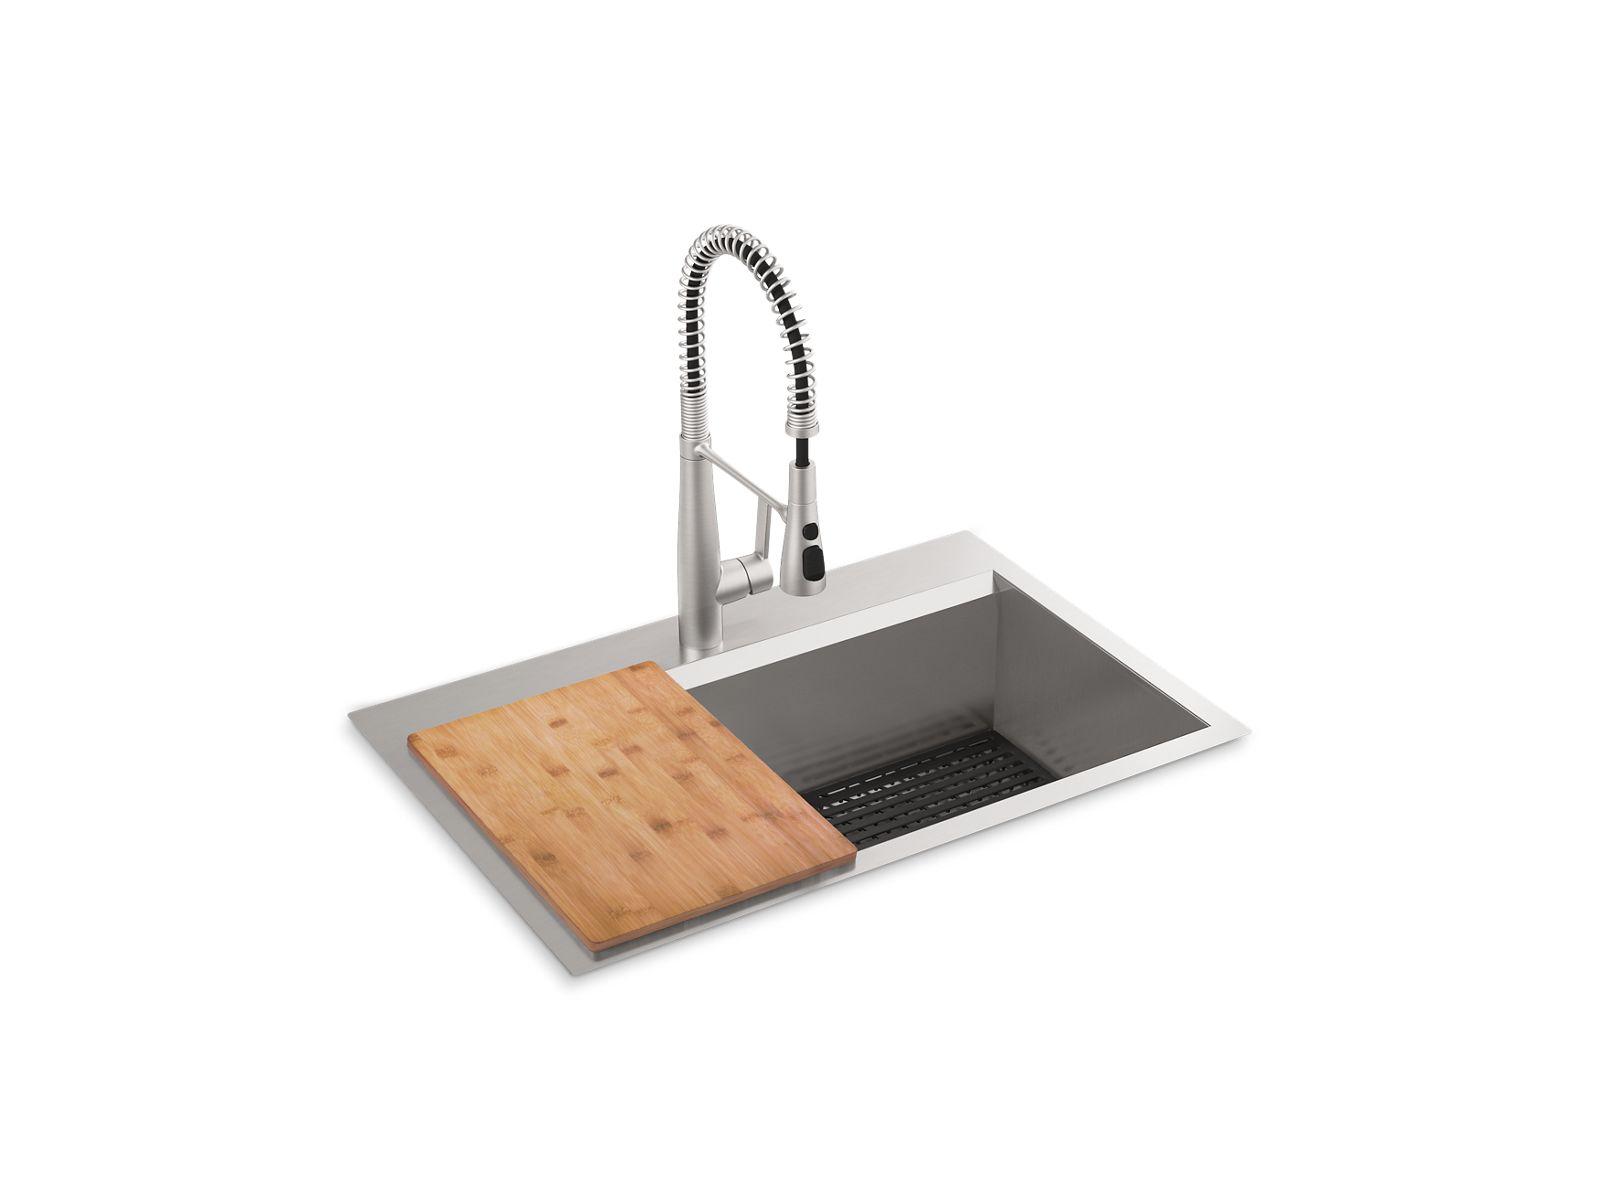 top mount undermount single bowl kitchen sink kit k rc78957 1pc kohler kohler